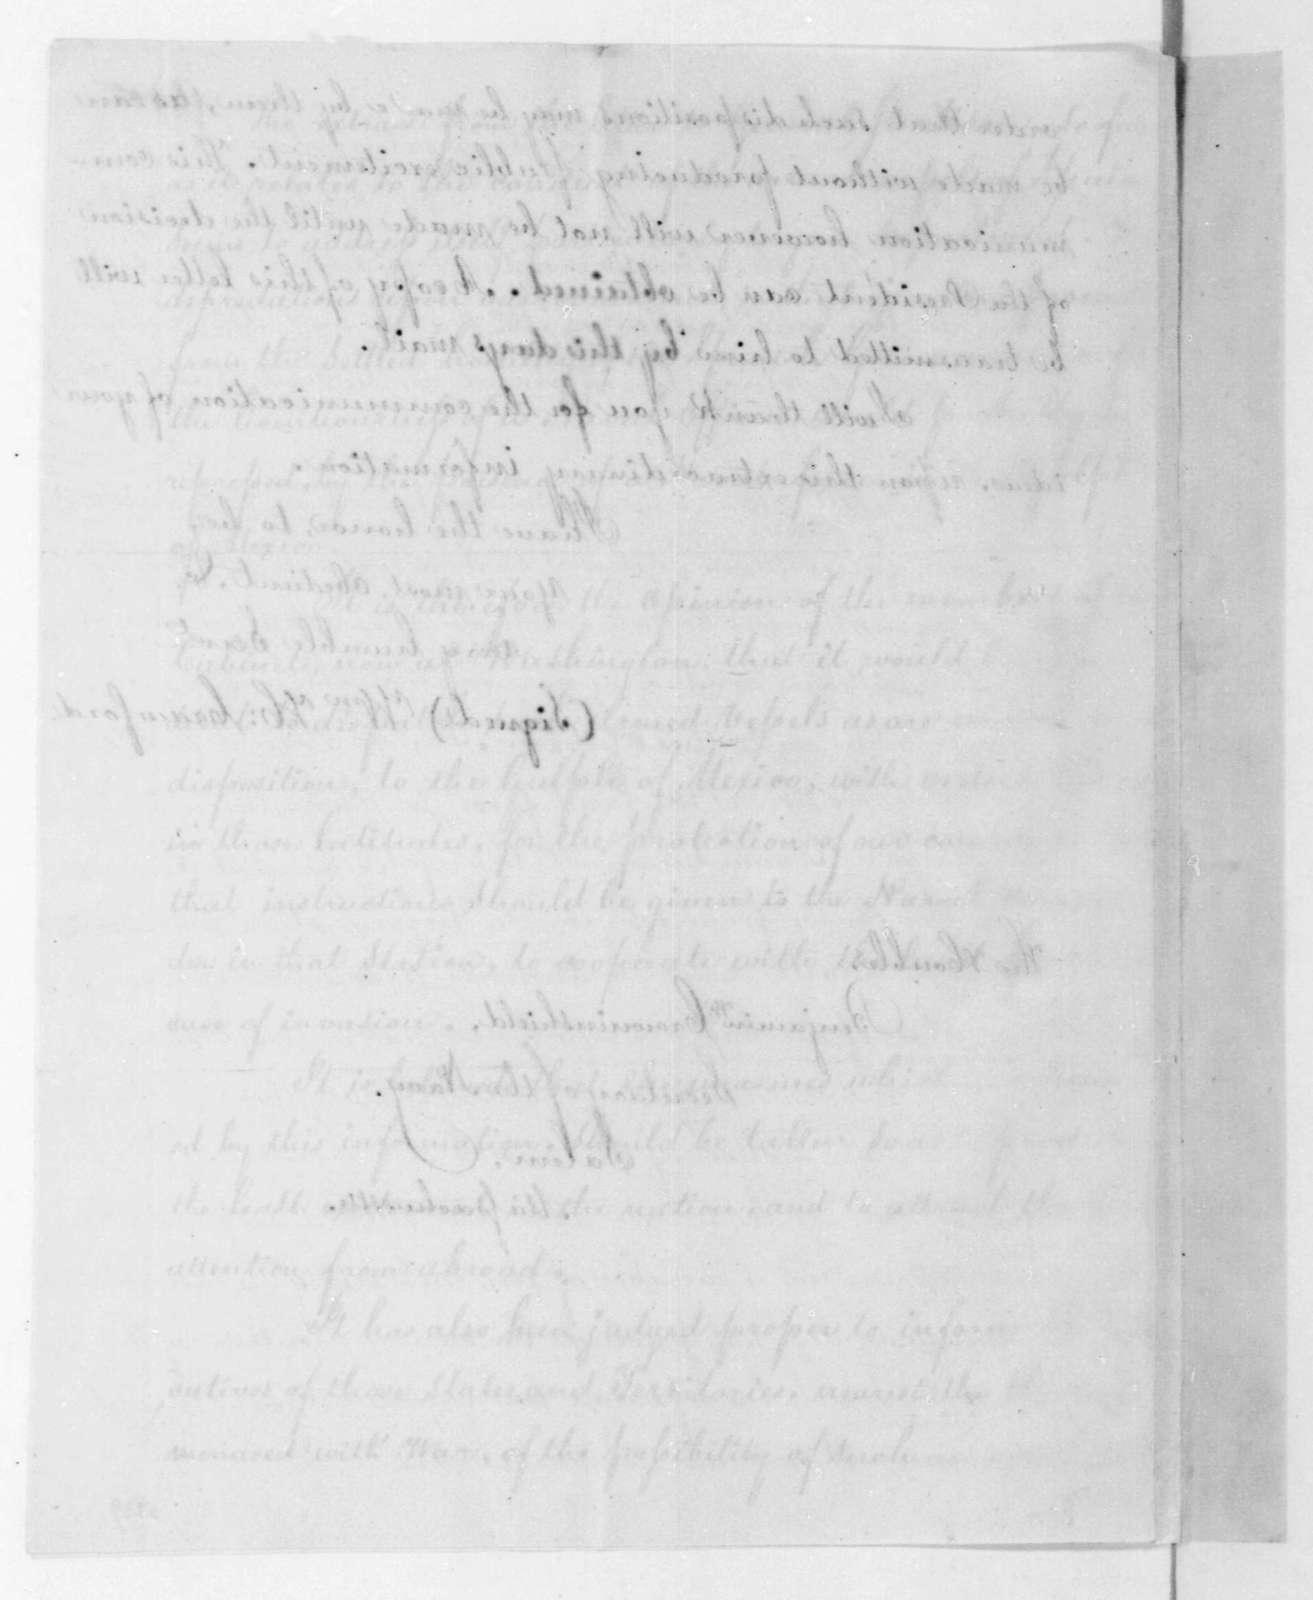 William H. Crawford to Benjamin W. Crowninshield, September 27, 1816.